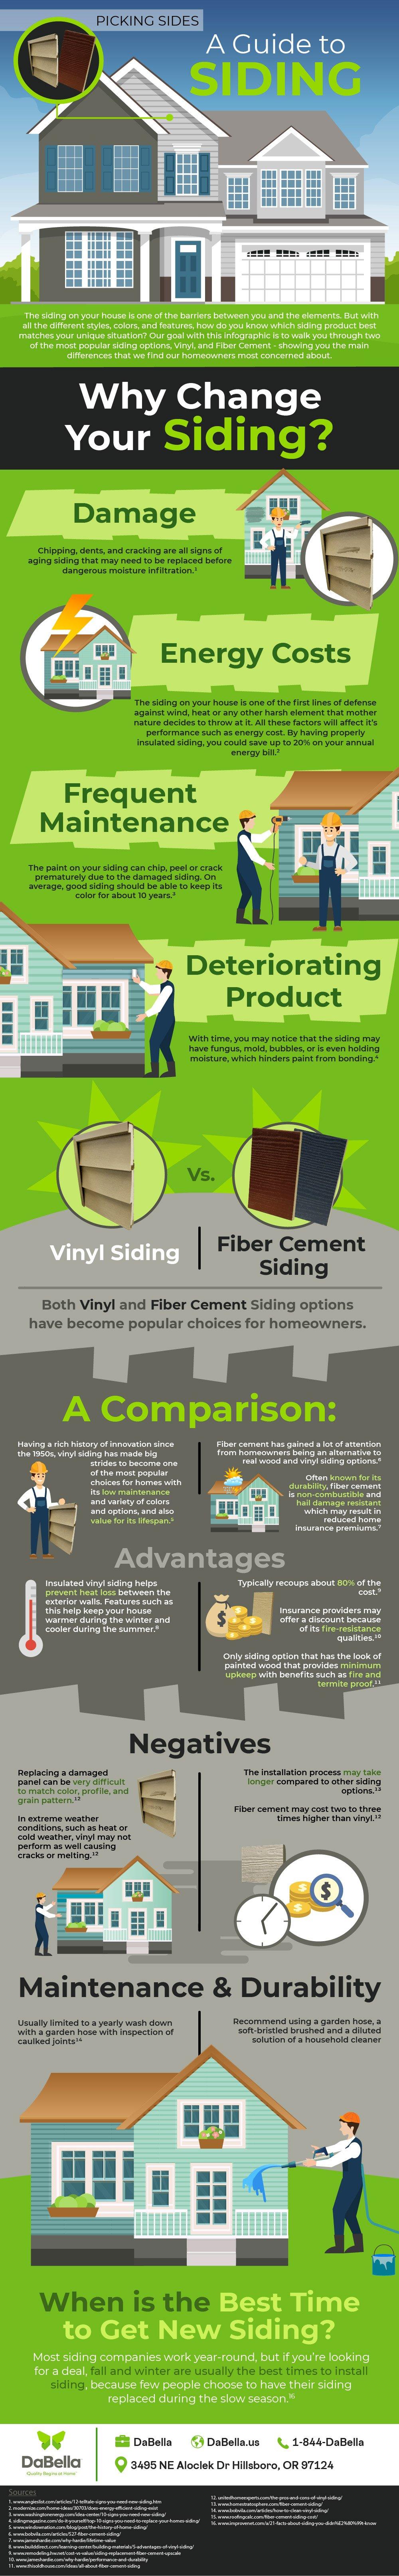 Siding infographic